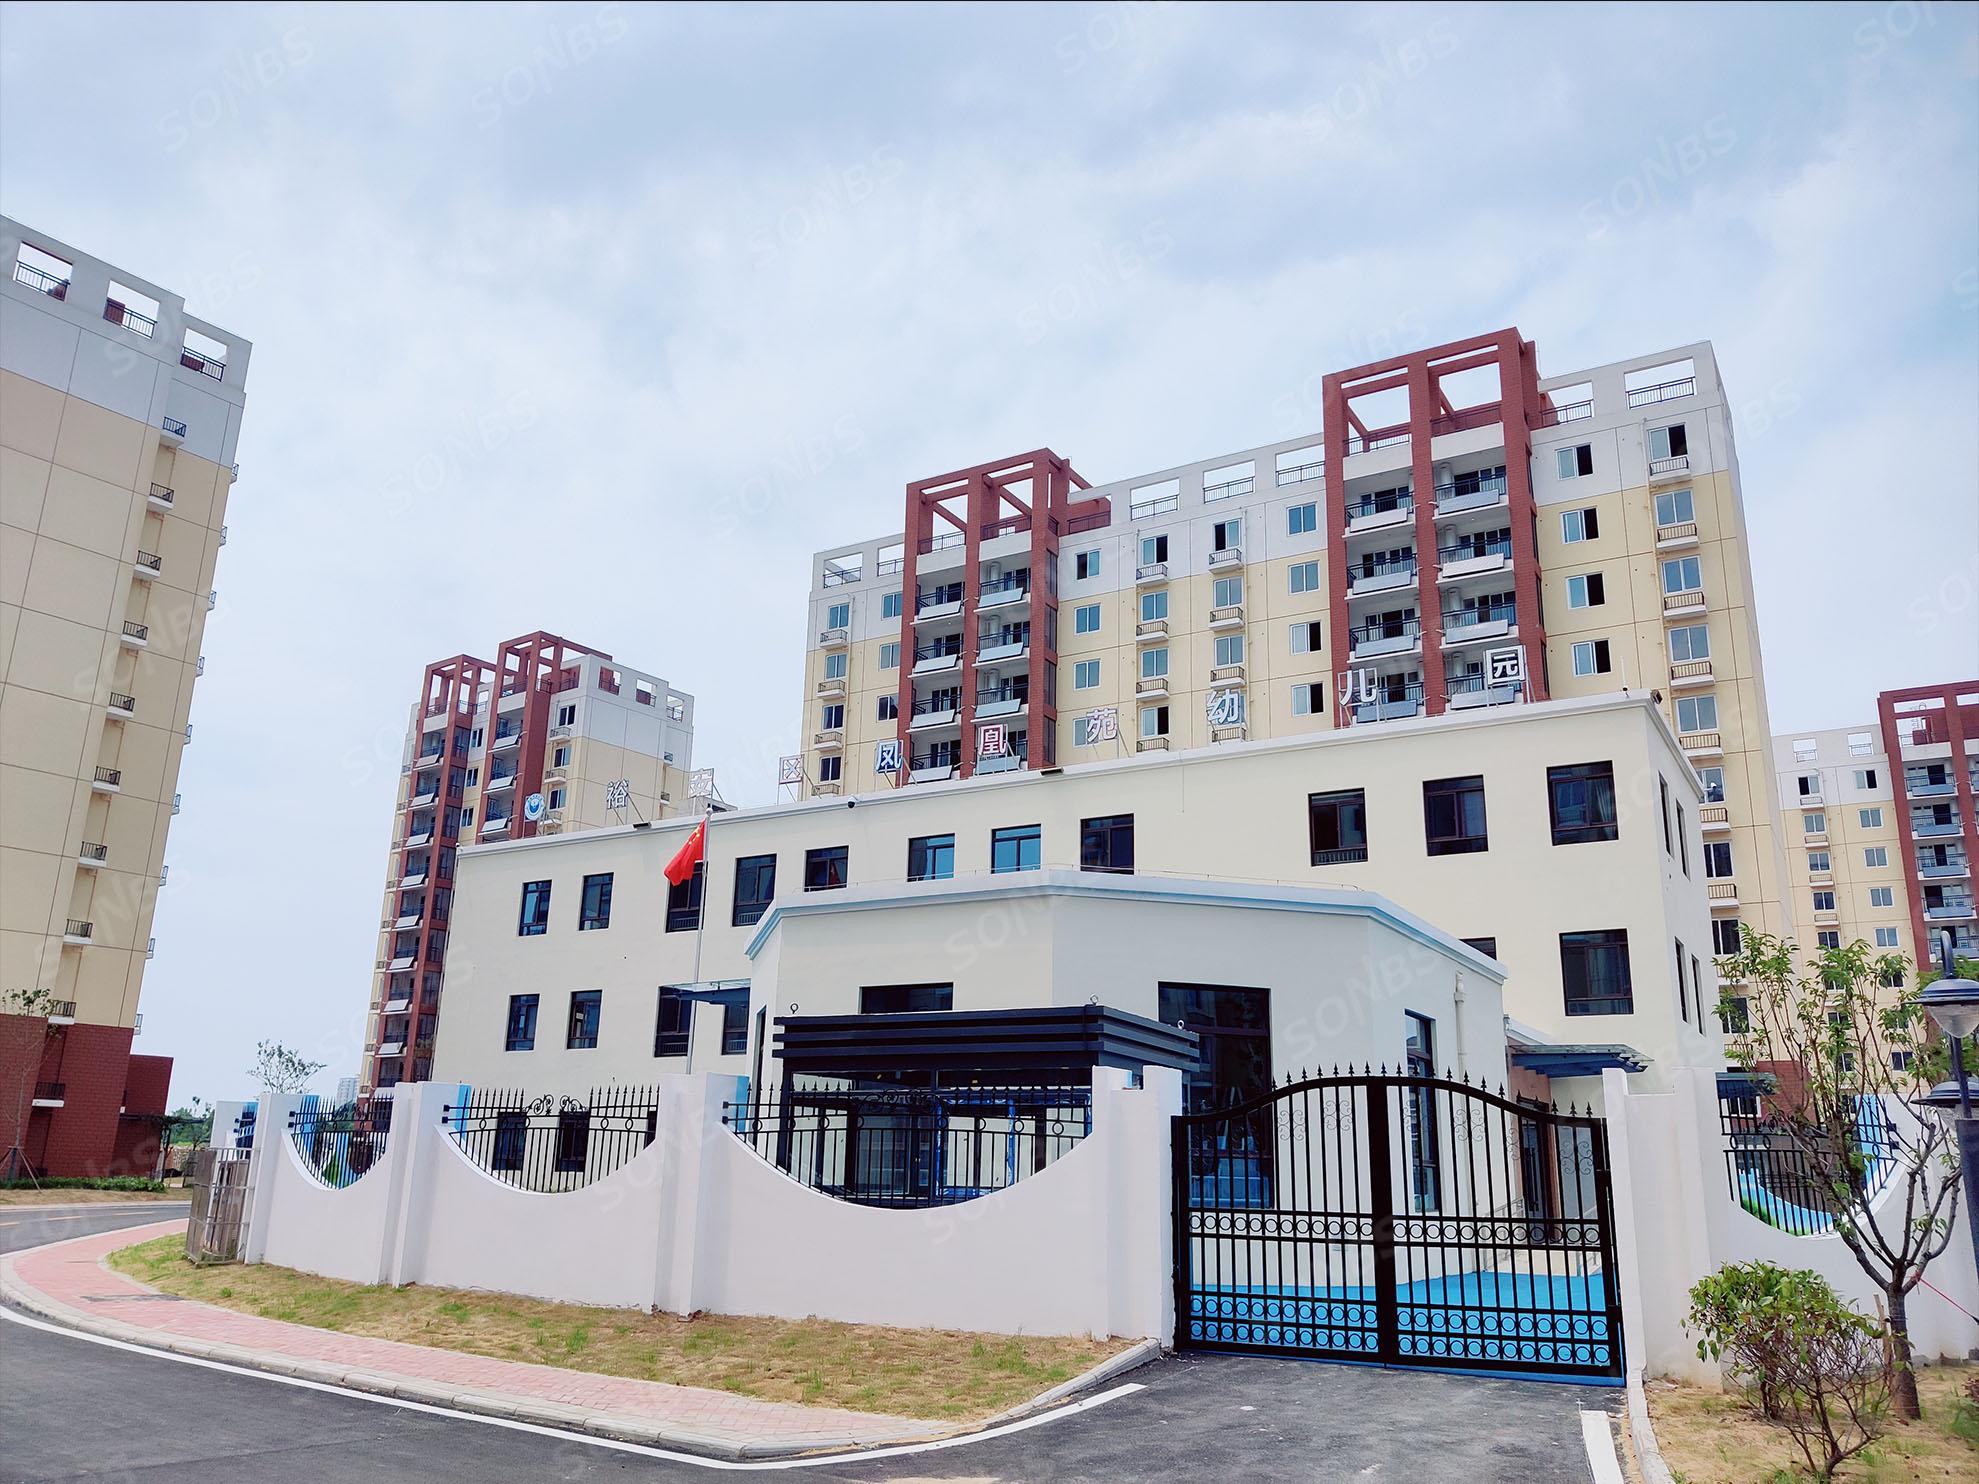 SONBS 高可靠IP网络广播系统成功应用于安徽省六安市凤凰苑幼儿园